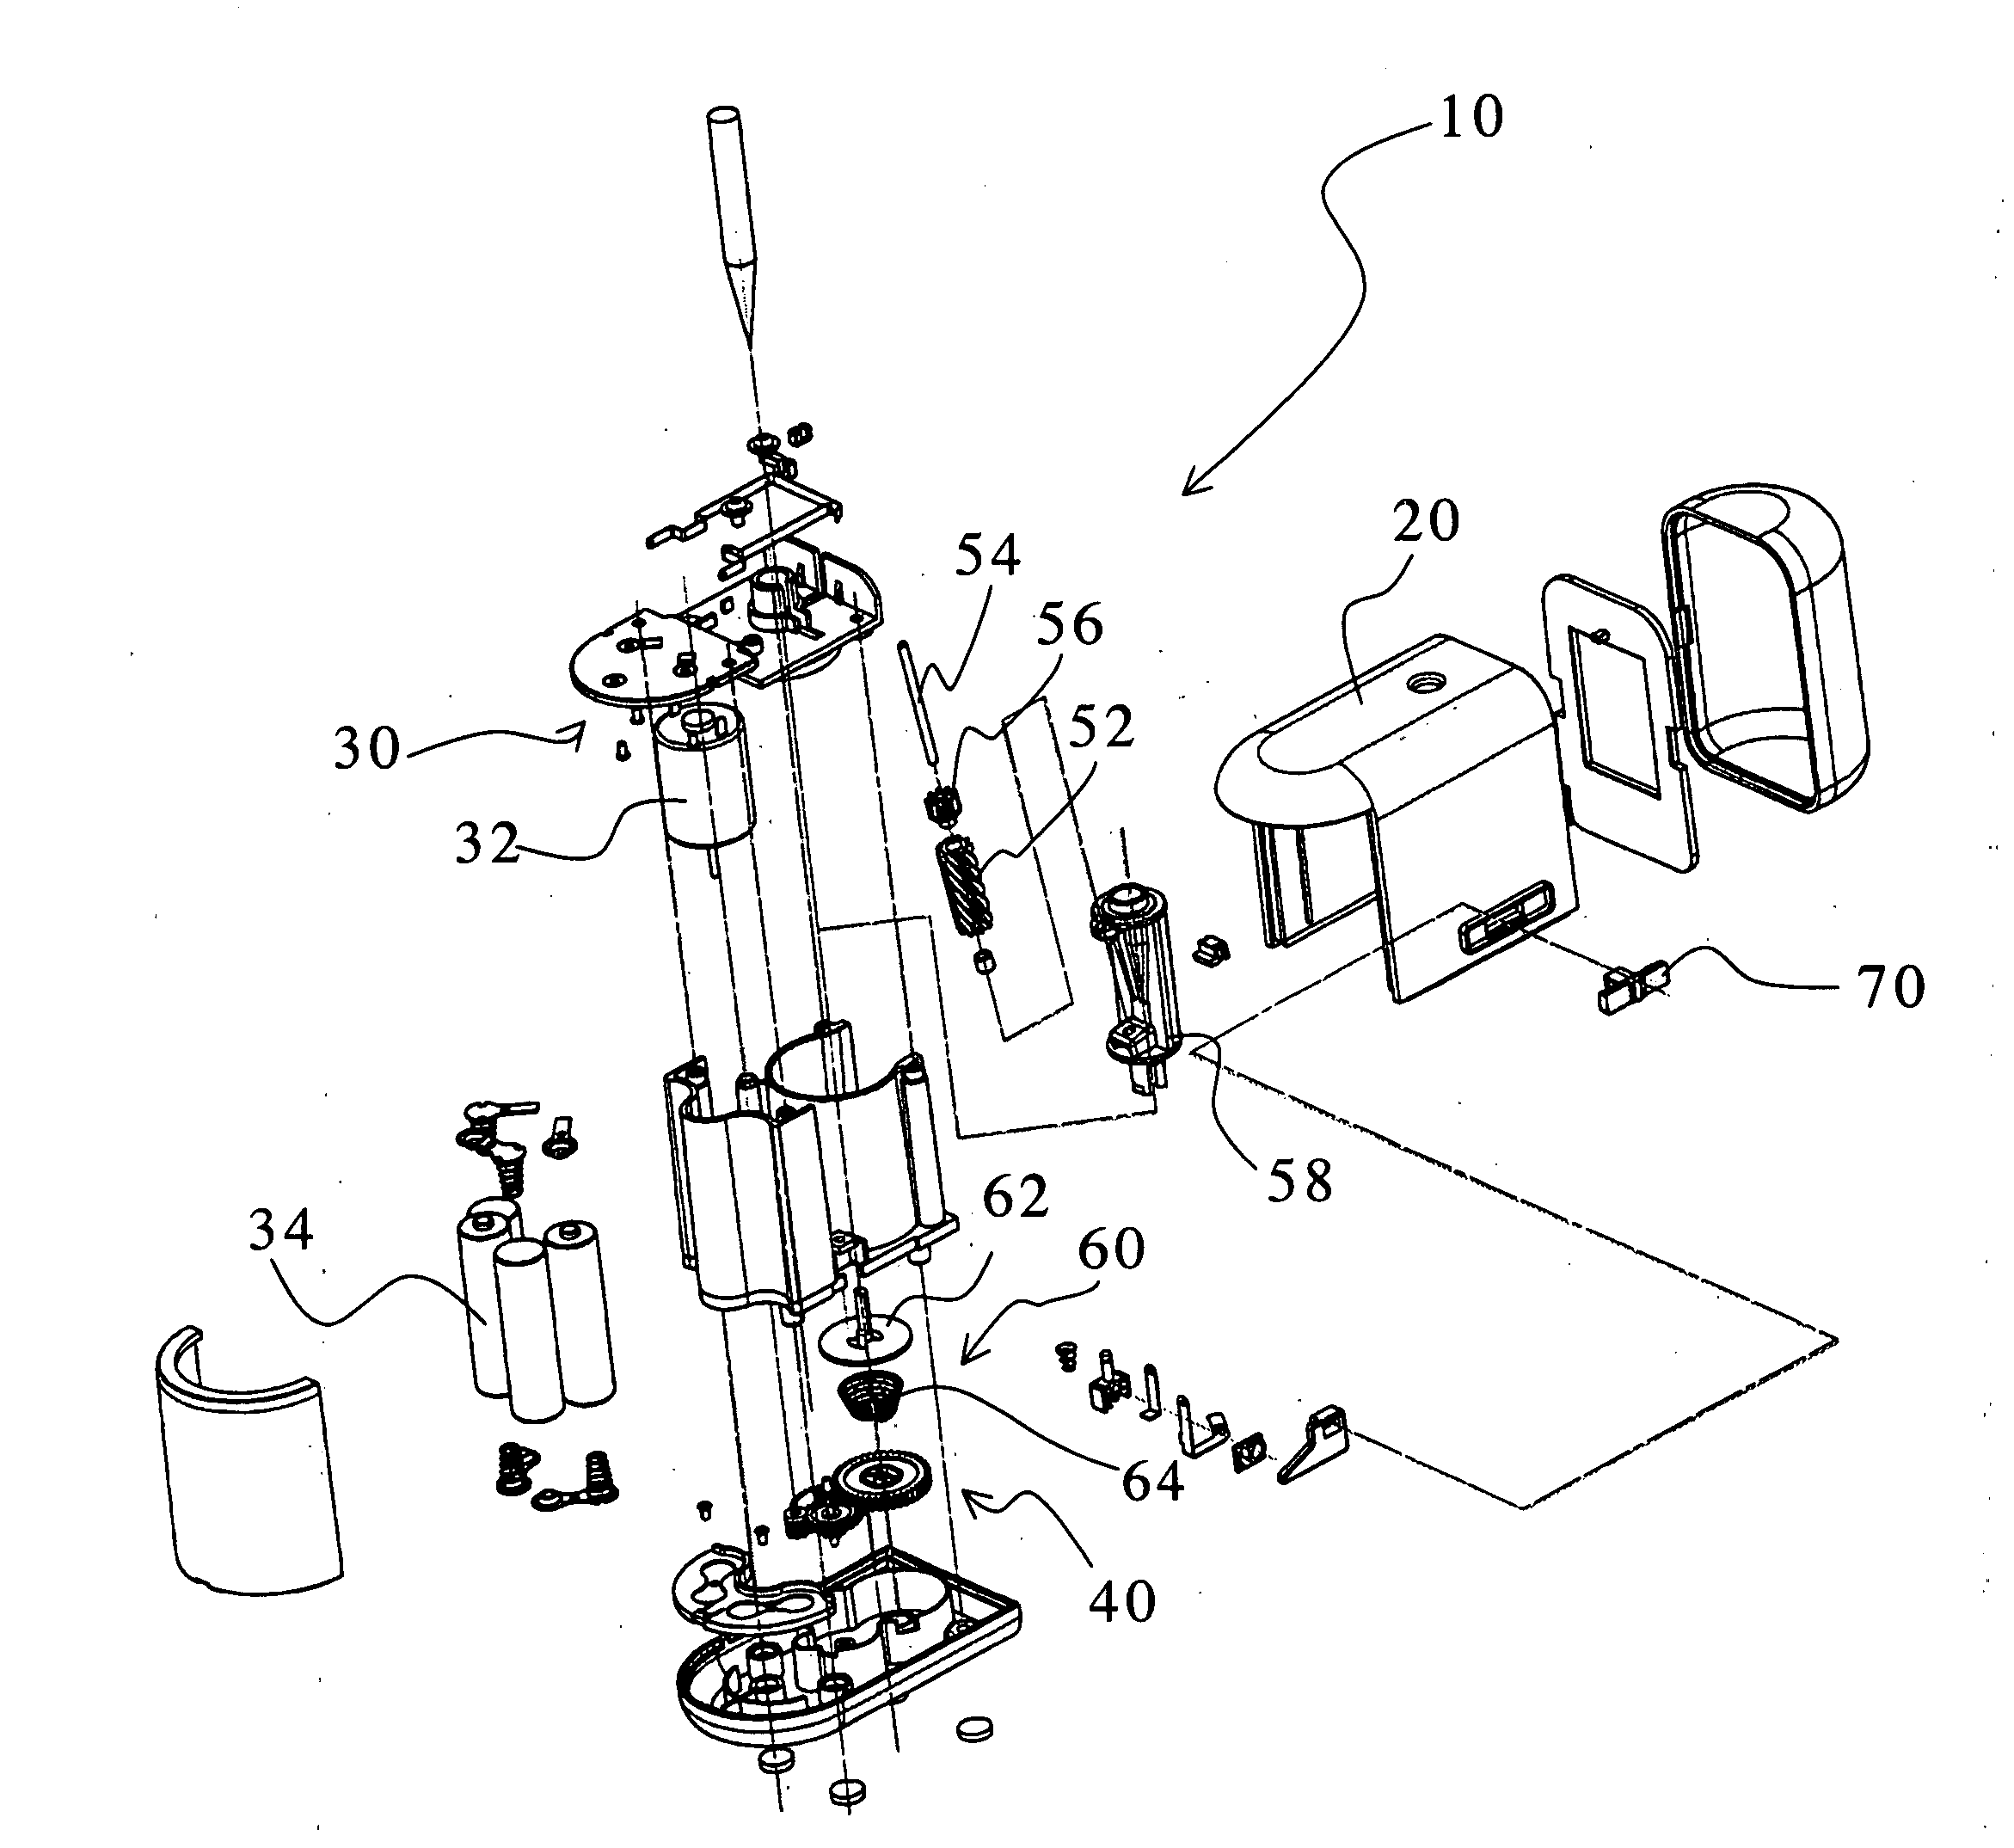 diagram mini atv wiring diagram chinese atv wiring diagrams 49cc 2